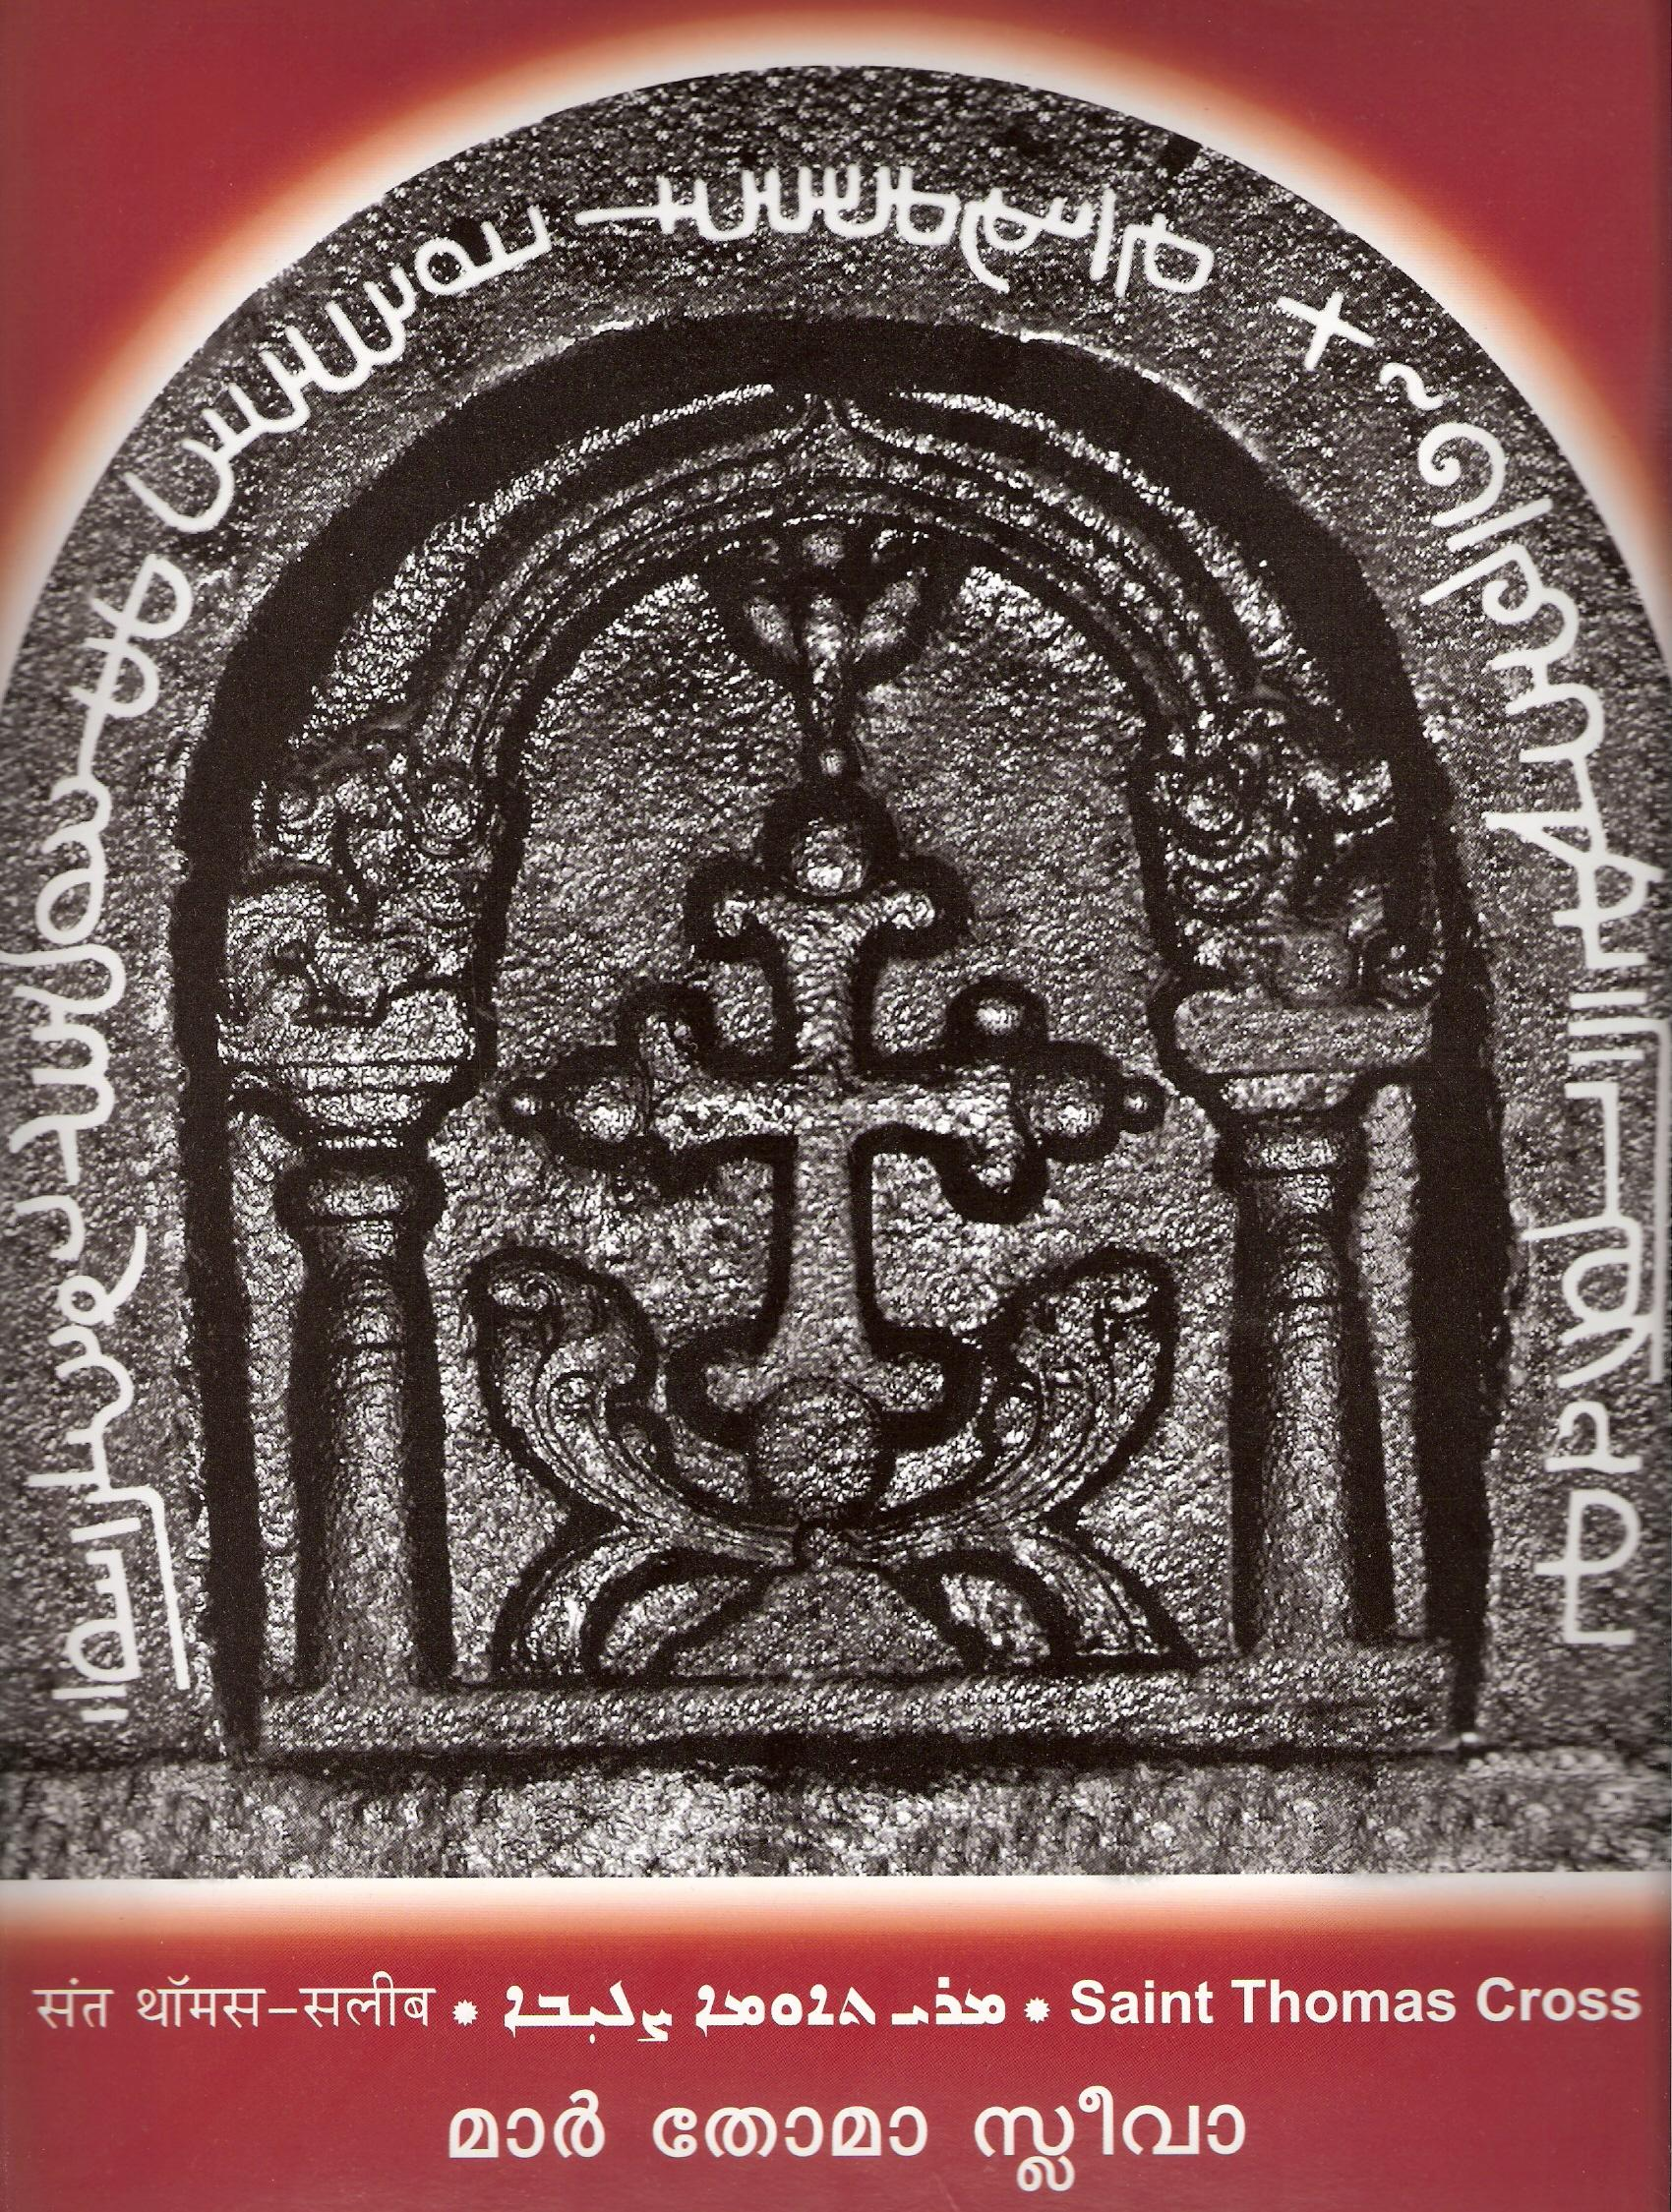 Saint Thomas Cross, Mar Thoma Cross, Mar Thoma Sliba- A Religio